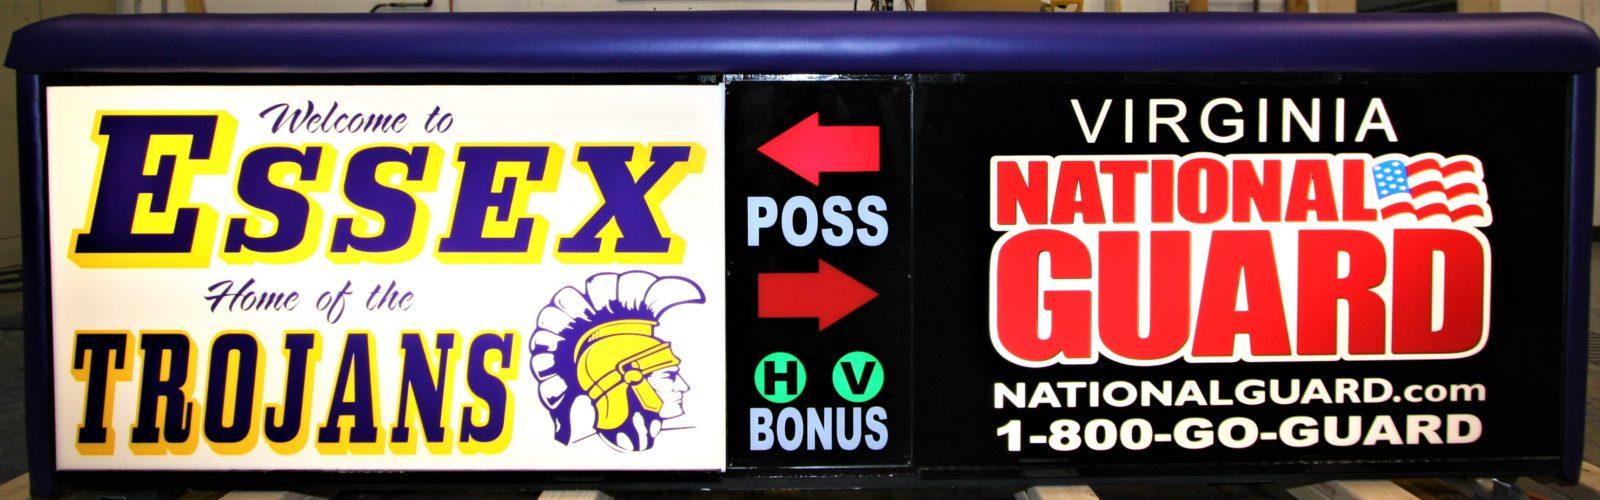 Essex High School Virginia Army National Guard scoring table